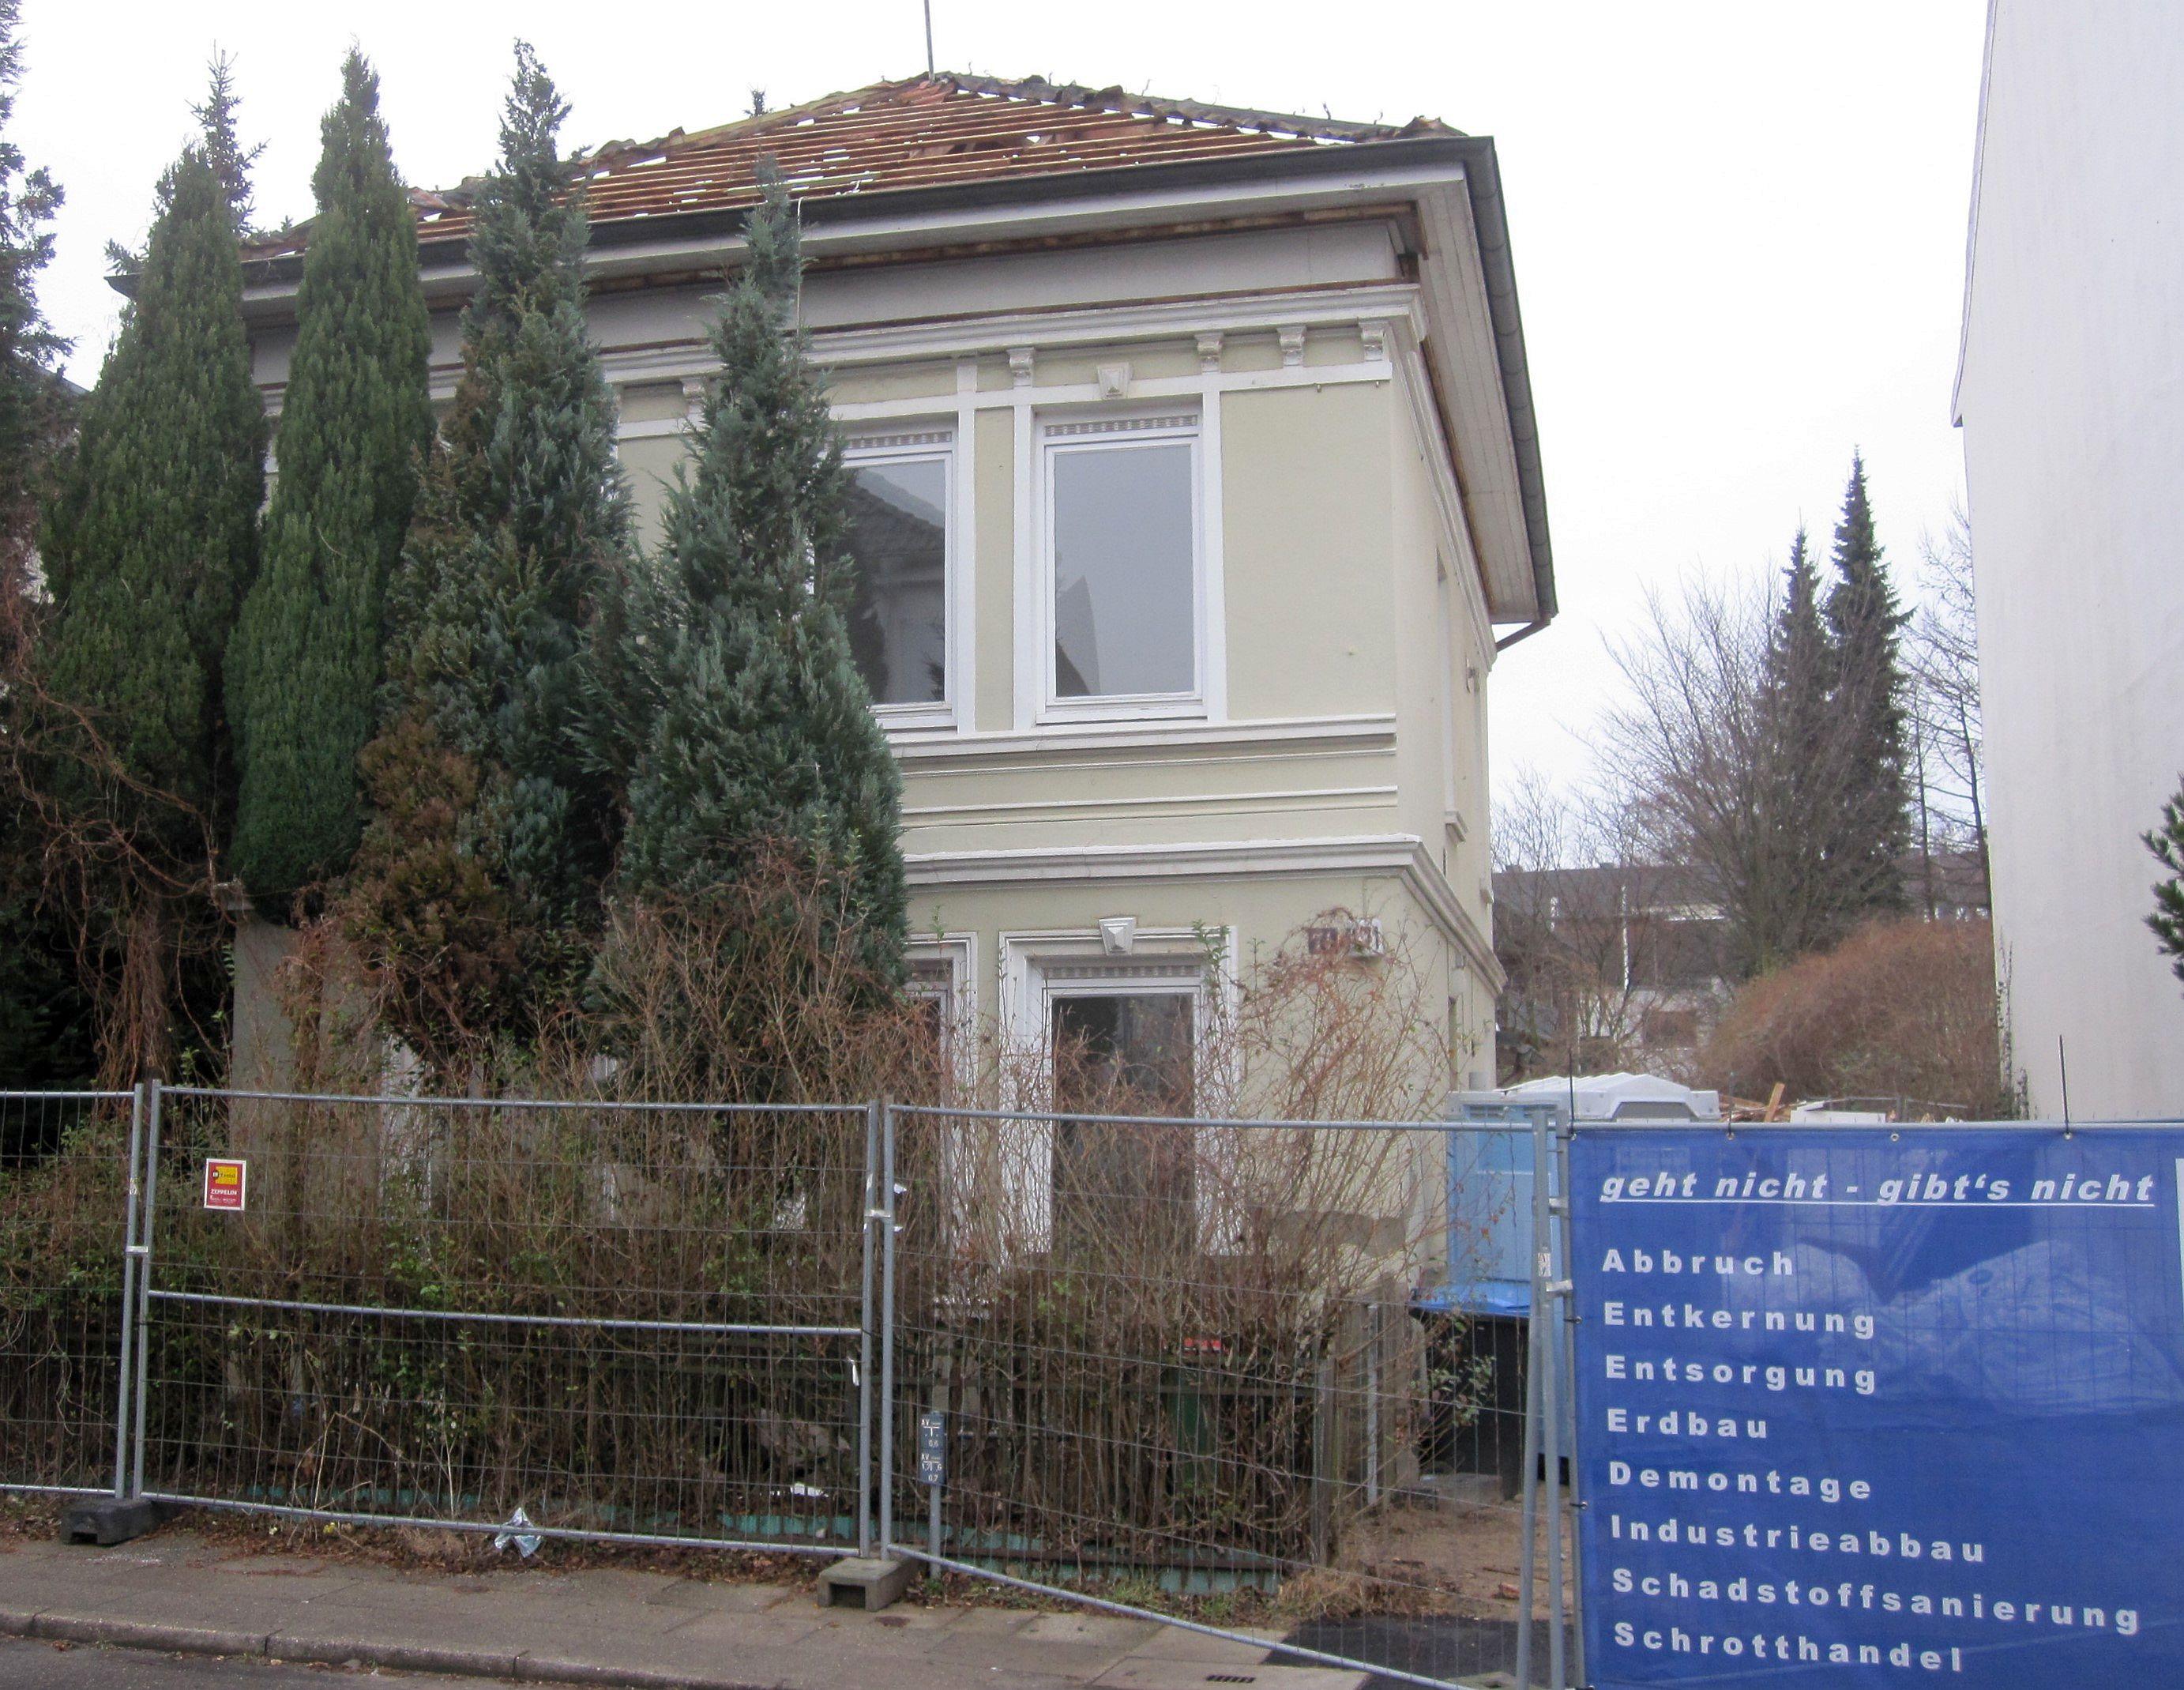 Hagenbeckstrasse_Lohmeyer.jpg (906 KB)